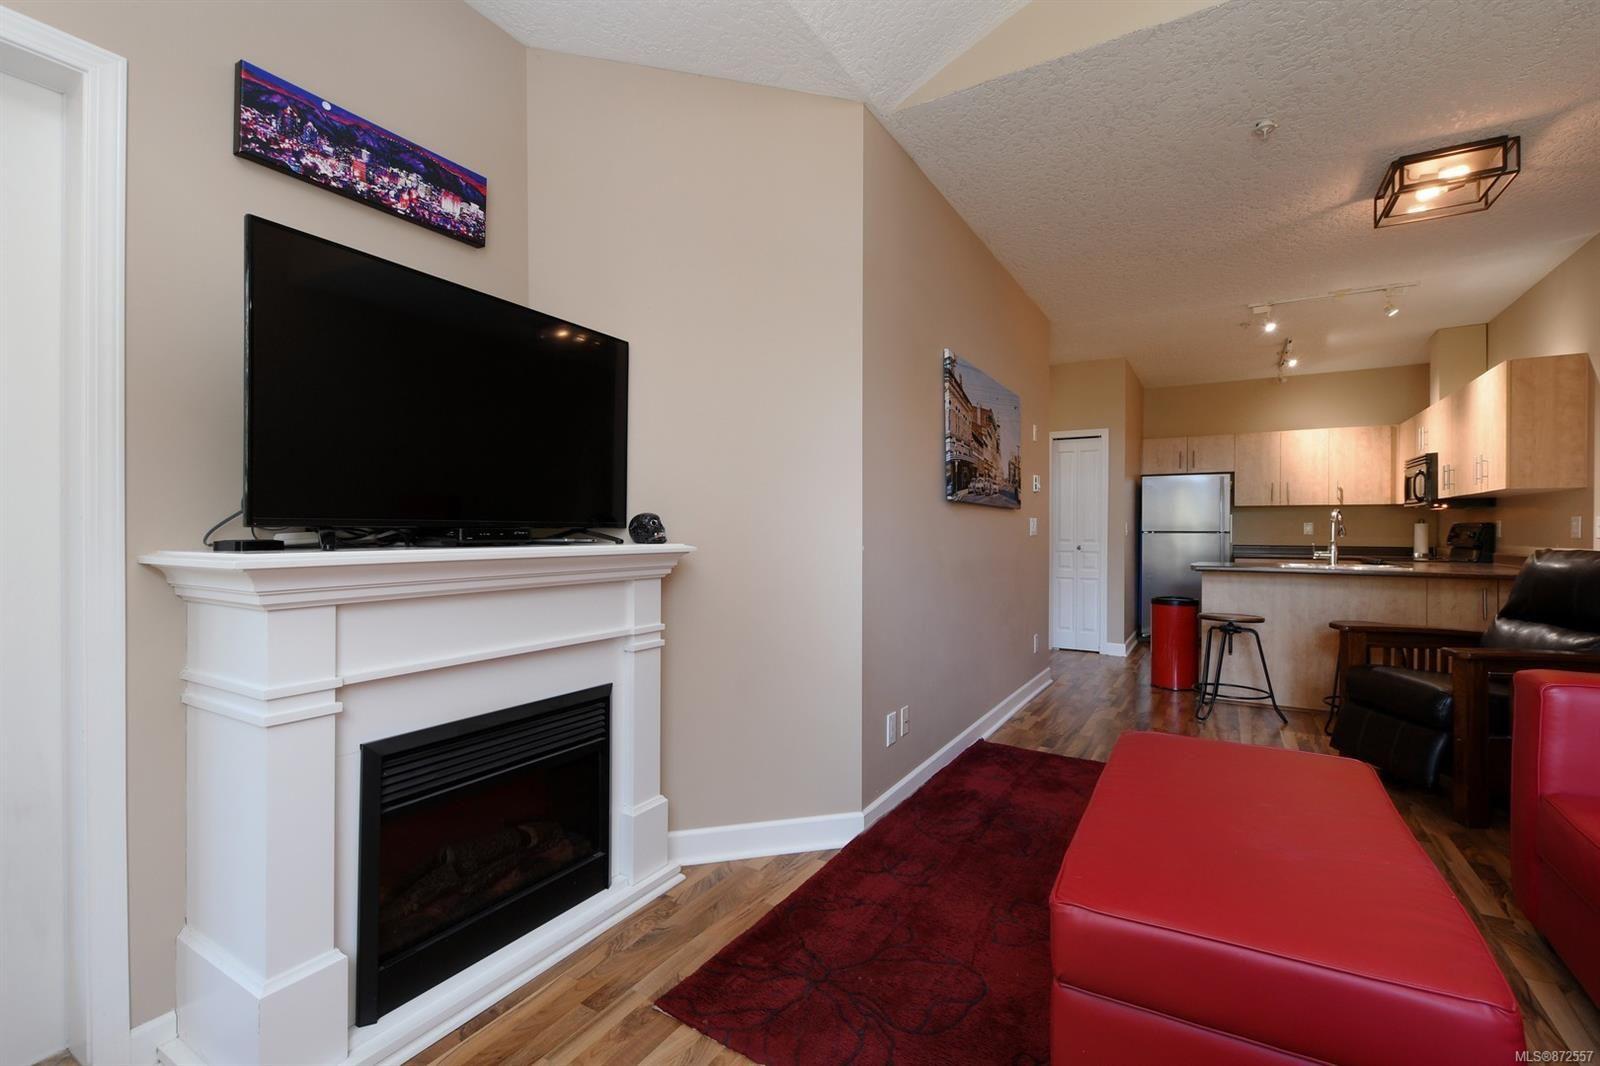 Photo 5: Photos: 411 825 Goldstream Ave in : La Langford Proper Condo for sale (Langford)  : MLS®# 872557